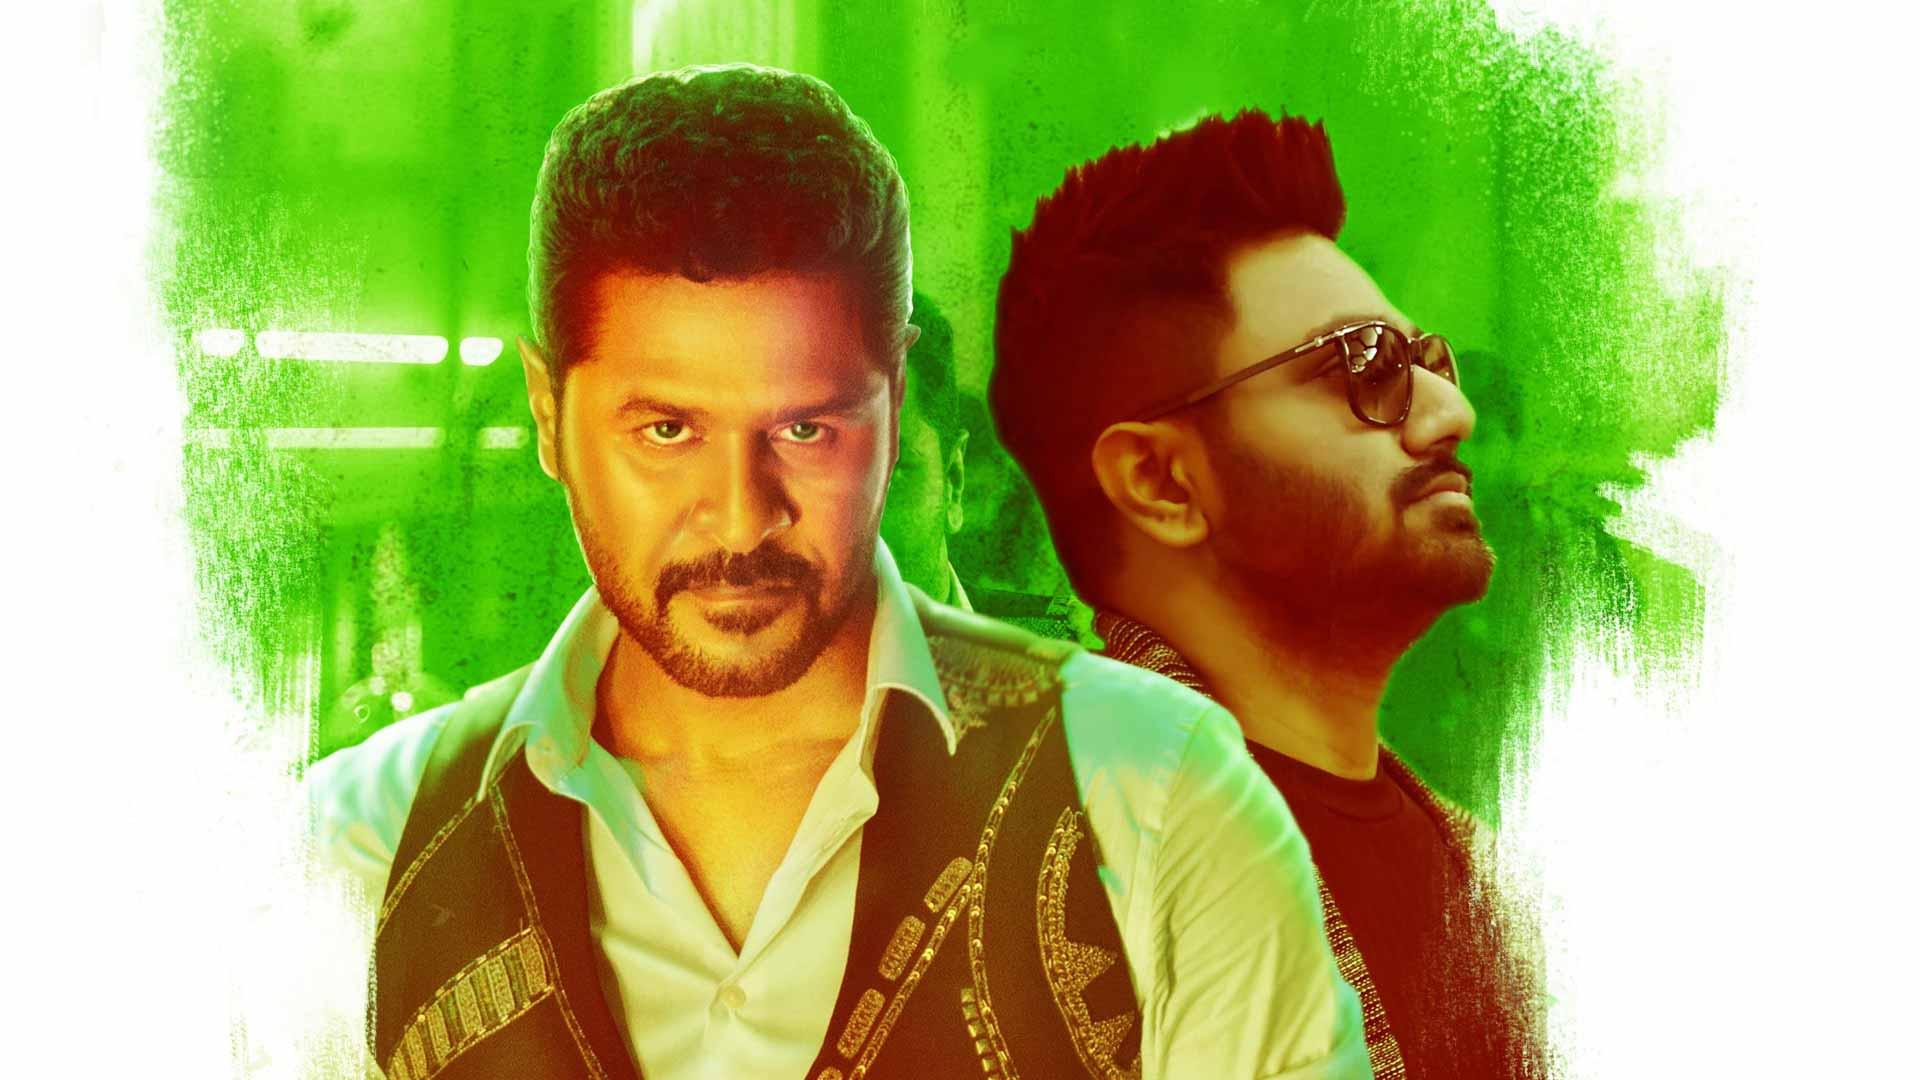 mercury tamil movie download 2018 torrent